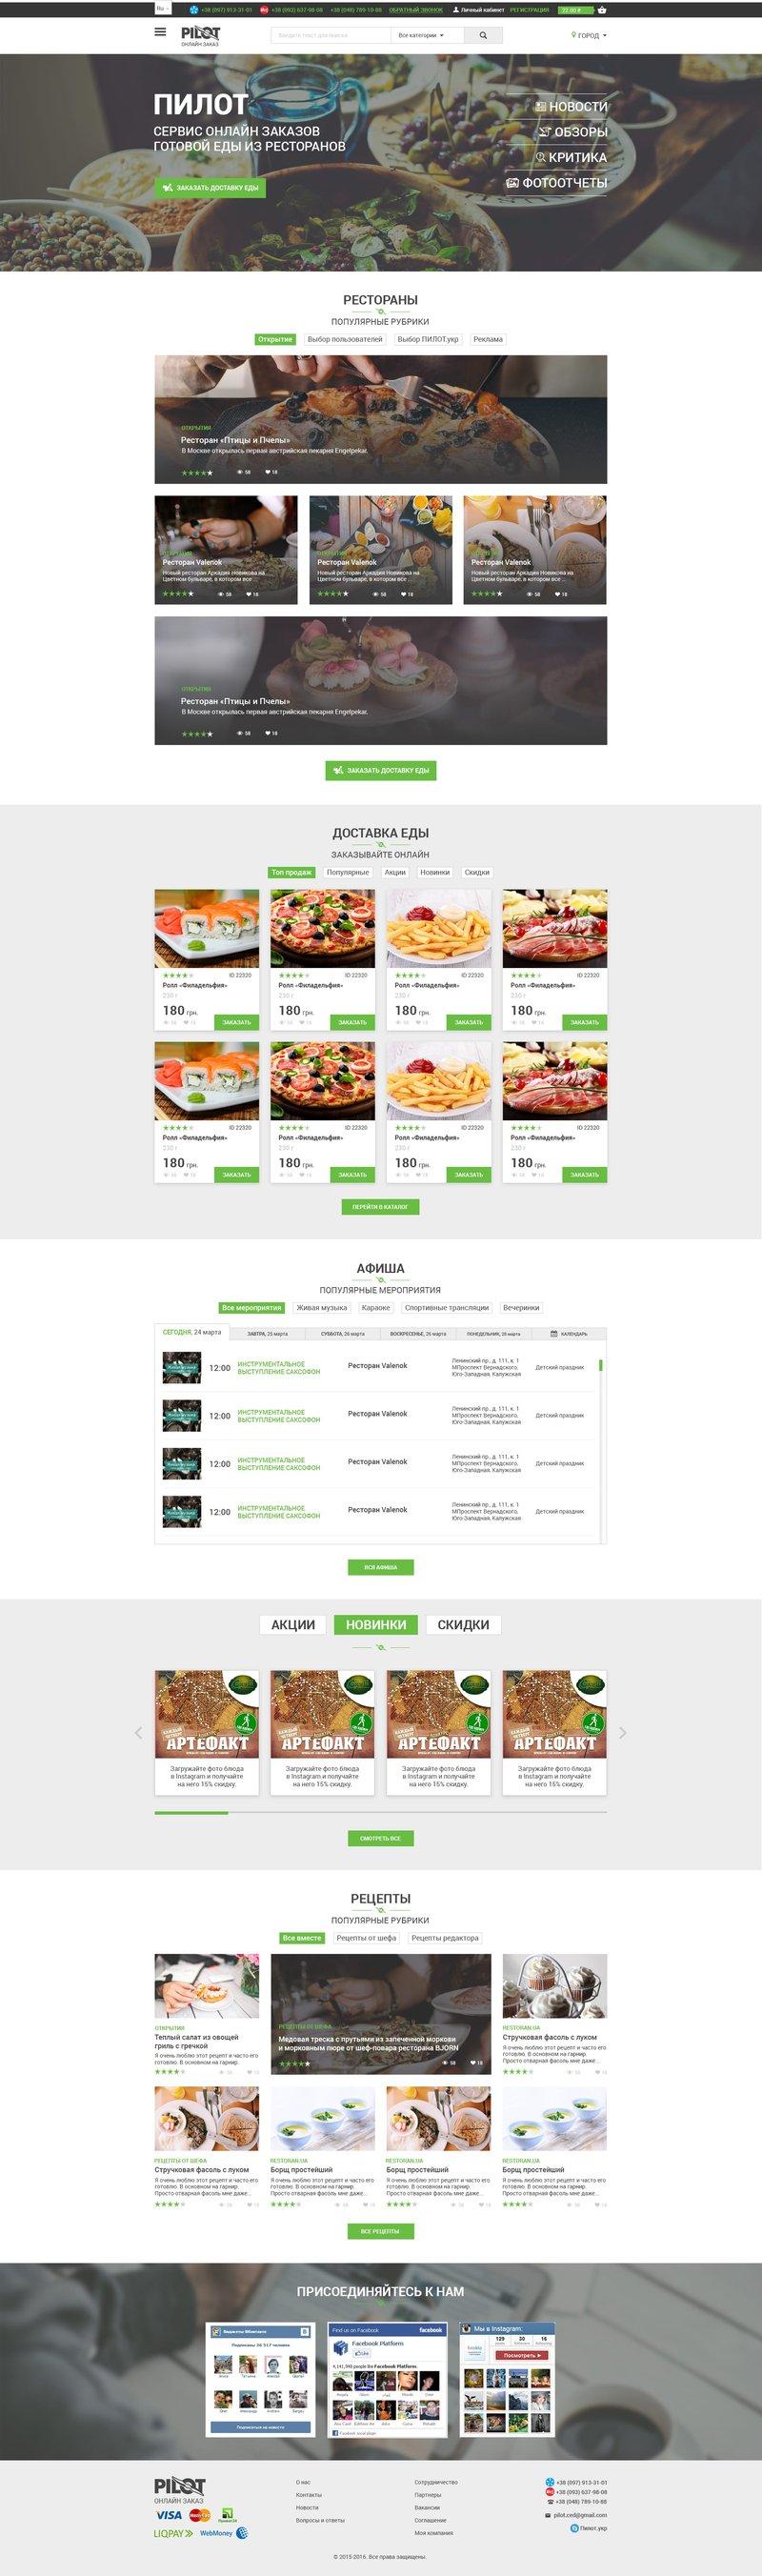 Дизайн портала по ресторанам – work in freelancer's portfolio